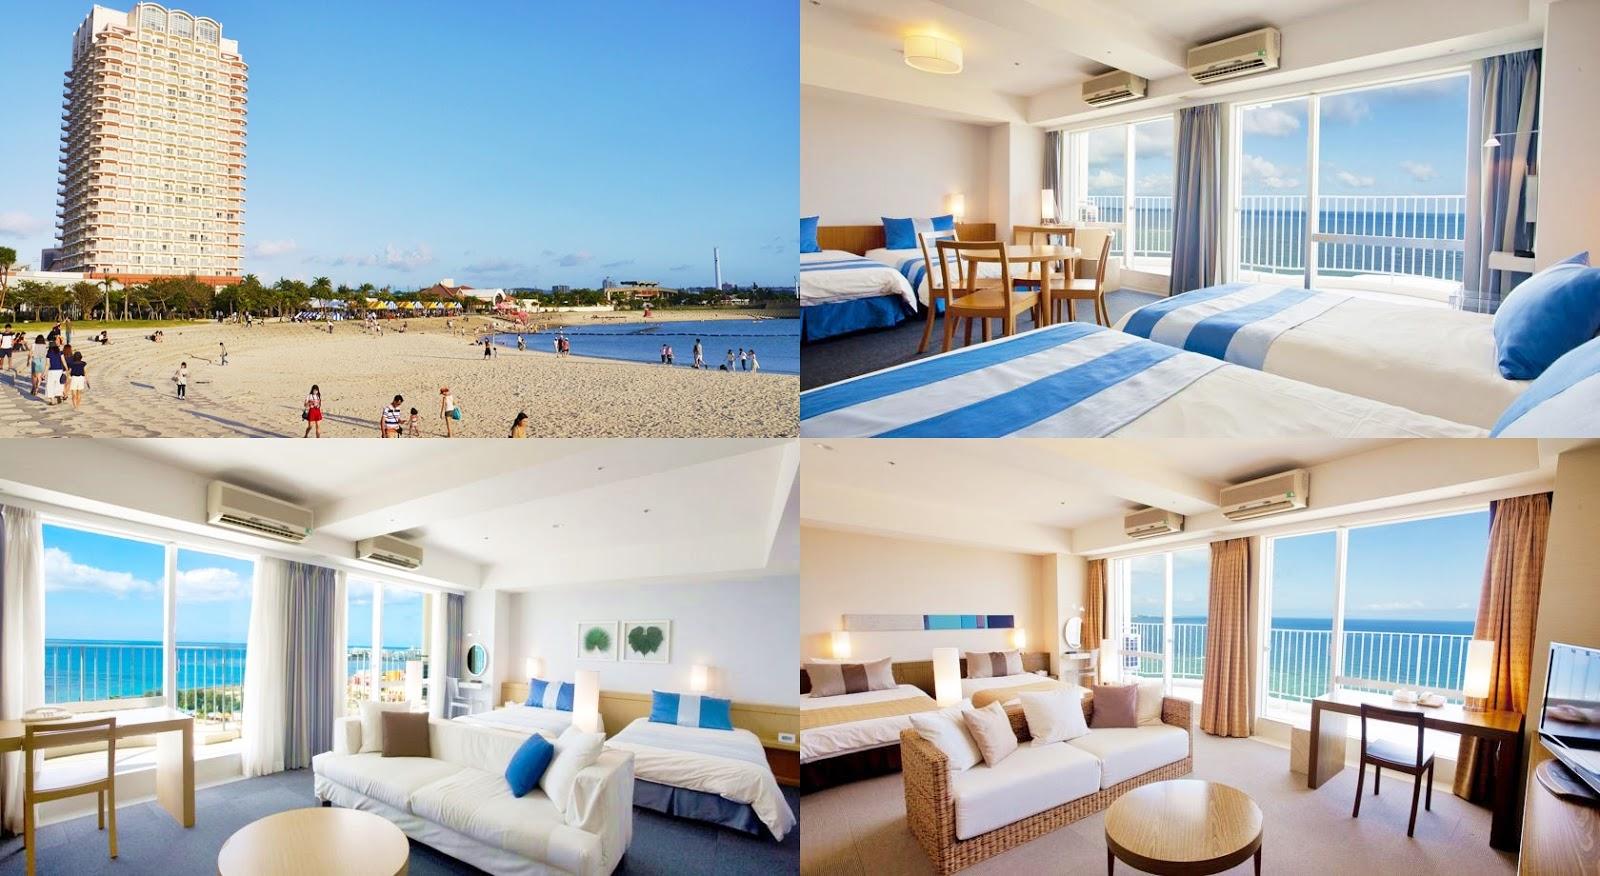 沖繩-住宿-推薦-沖繩海灘塔大廈-The-Beach-Tower-of-Okinawa-hotel-recommendation